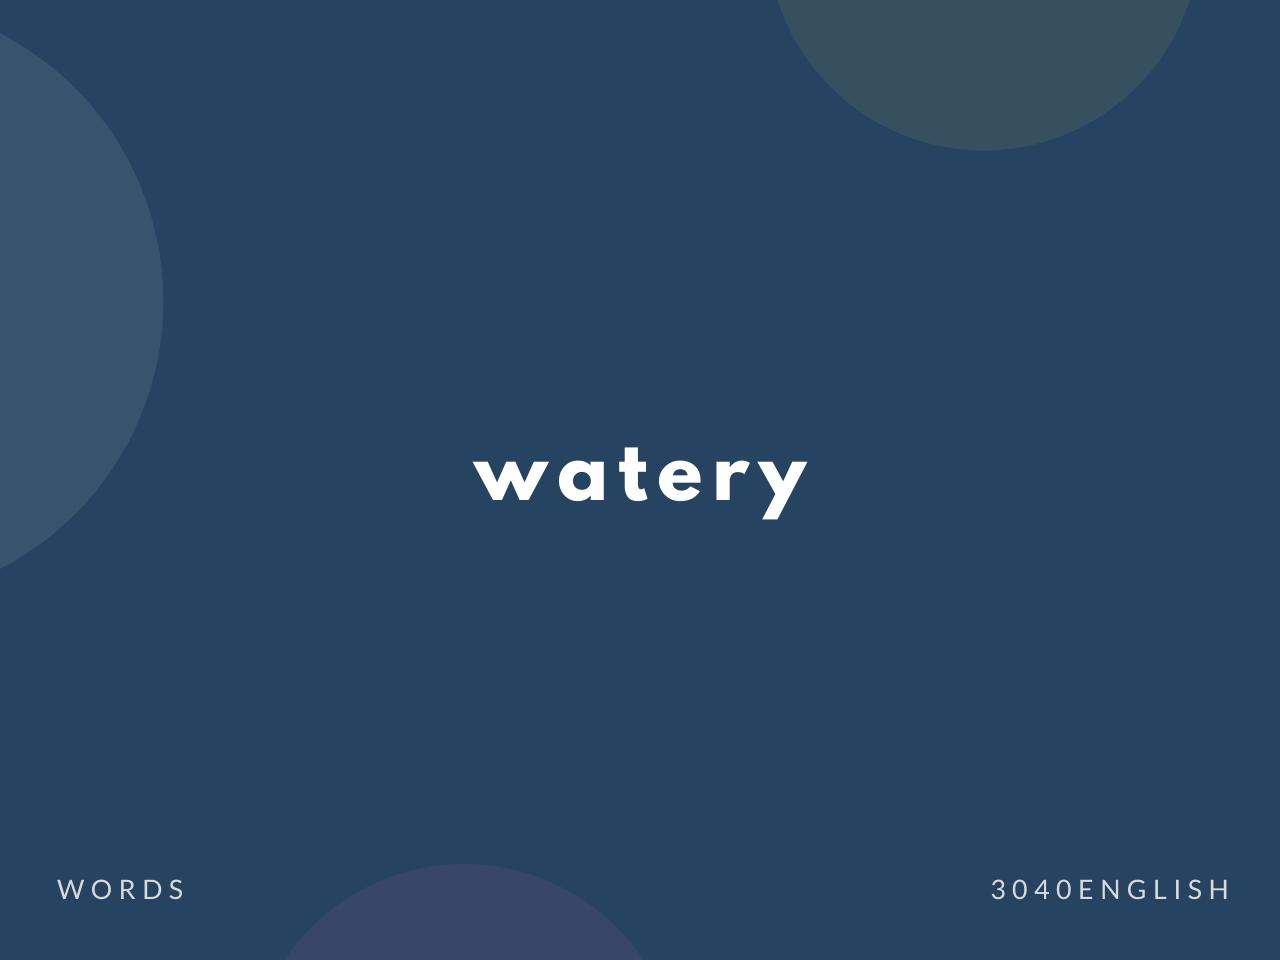 watery の意味と簡単な使い方【音読用例文あり】